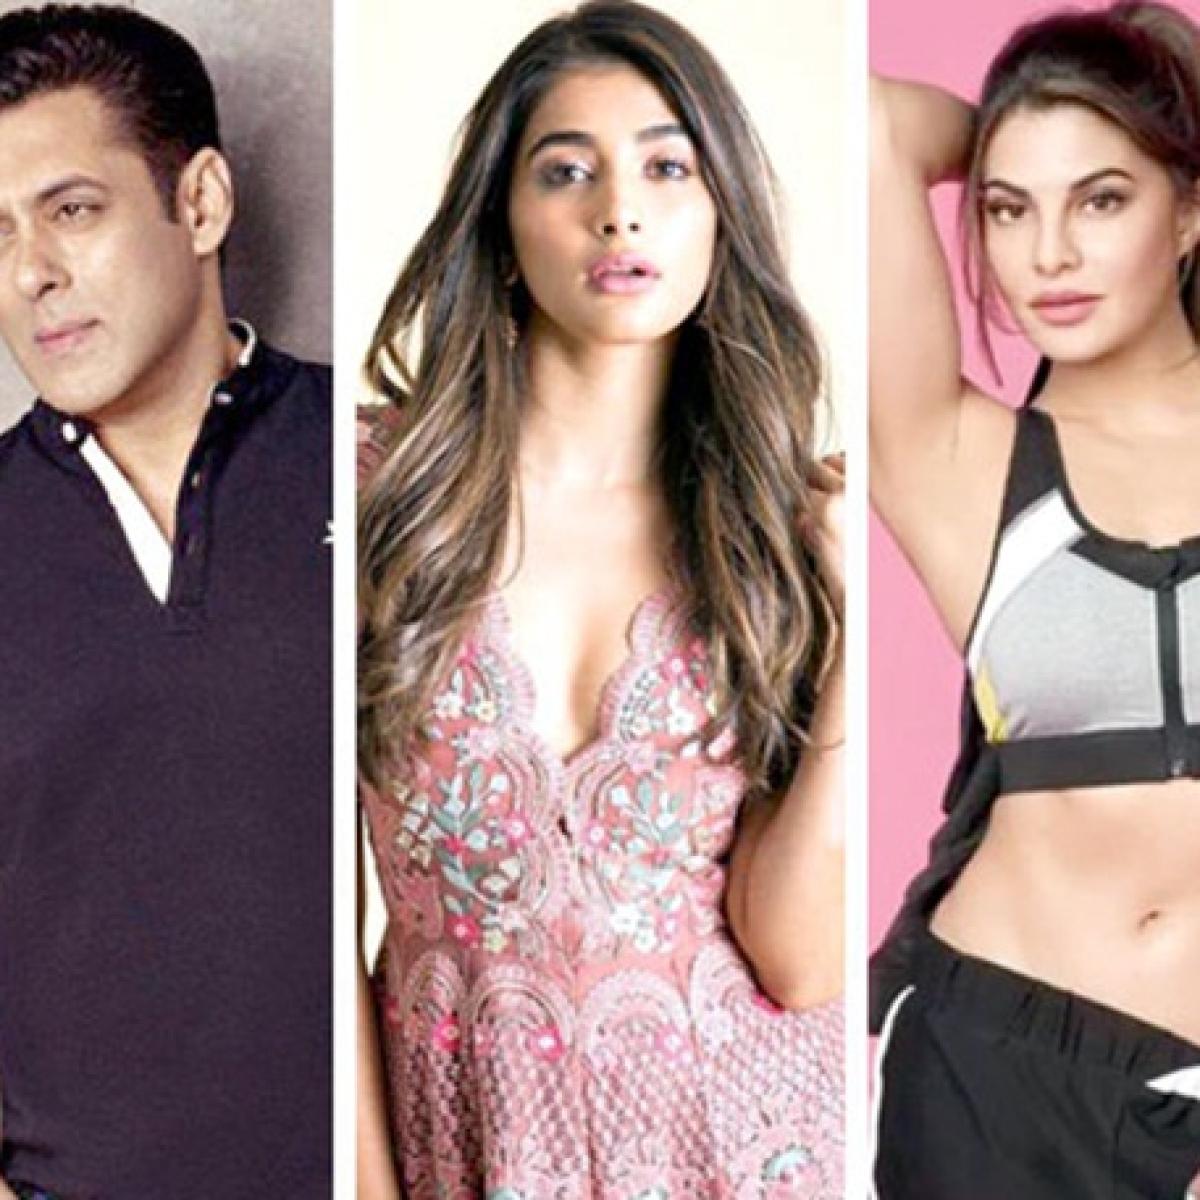 Kick 2: Jacqueline Fernandez, Pooja Hegde or Kriti Sanon - who will be Salman Khan's leading lady?